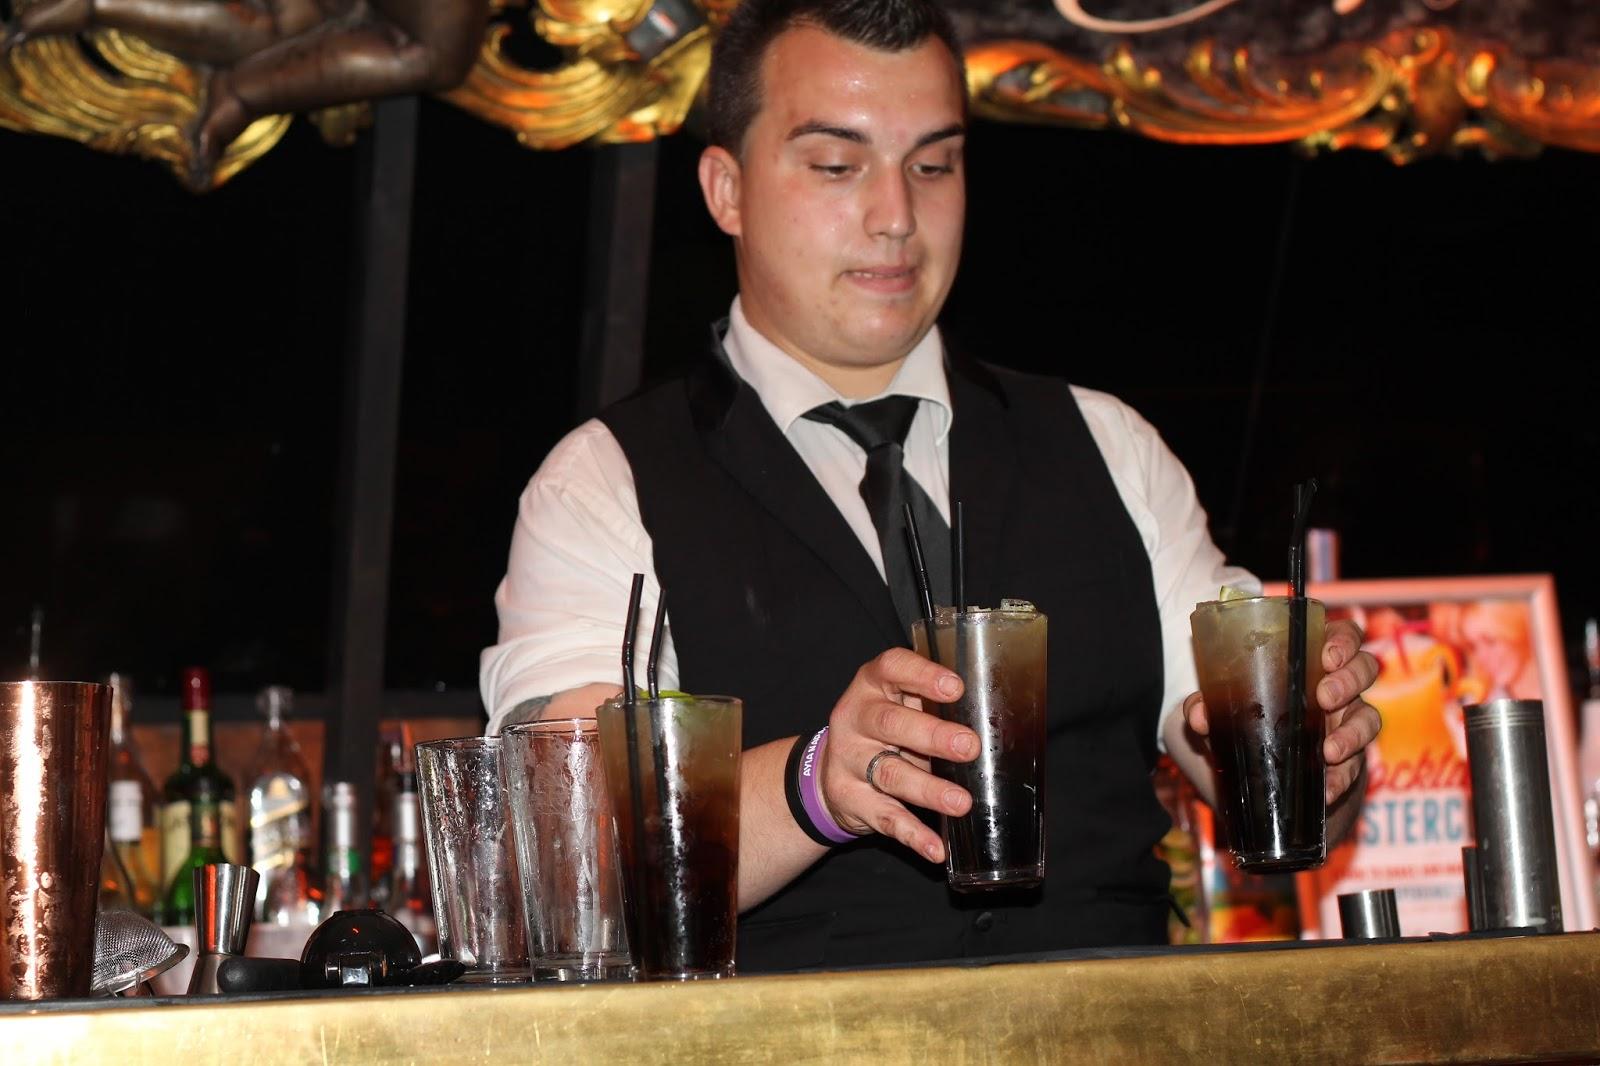 Cocktail masterclass, soda bar cardiff, long island ice tea